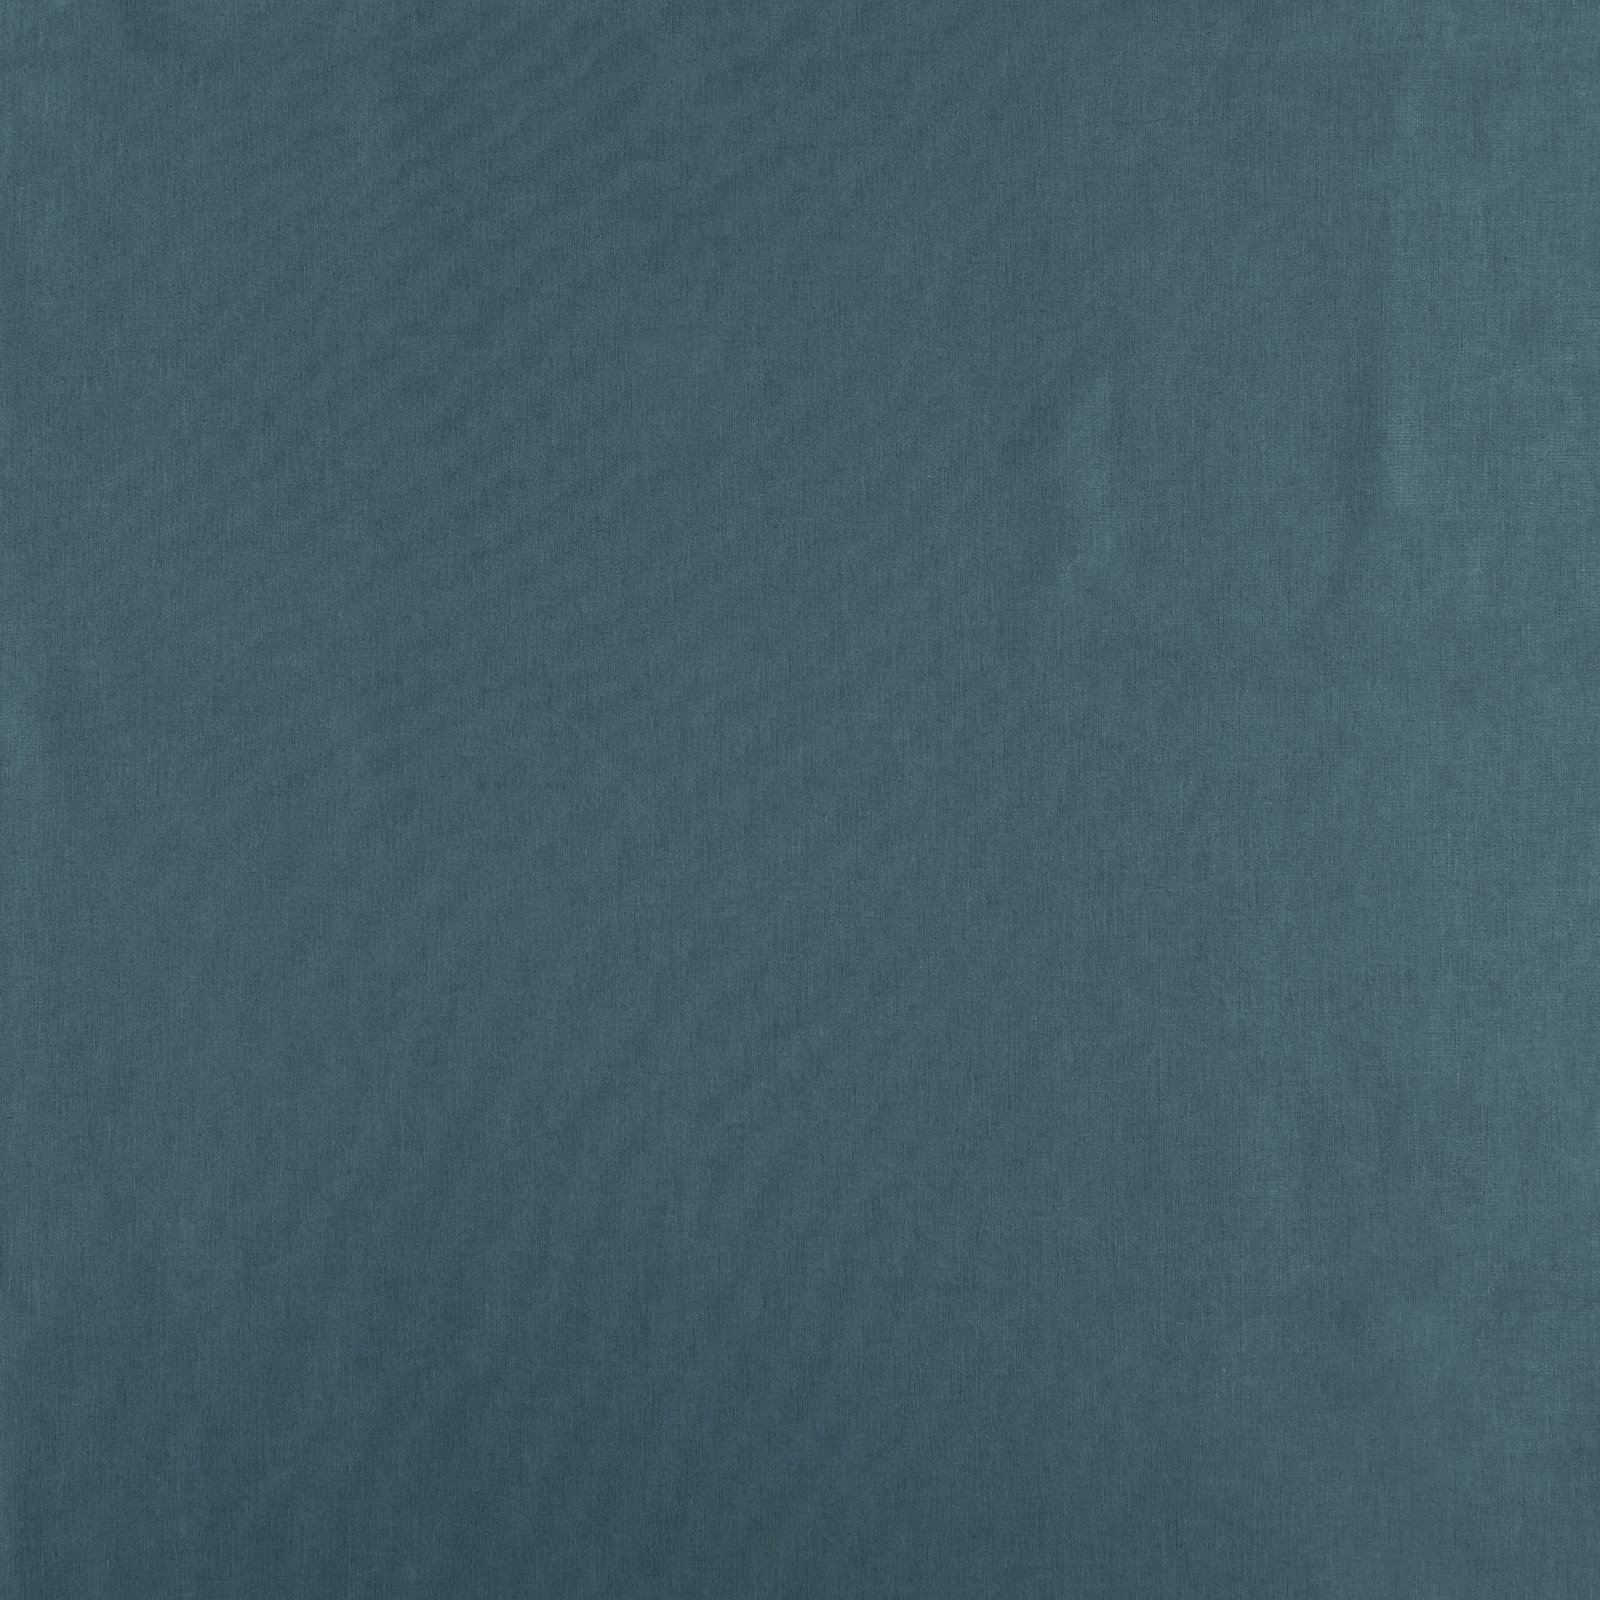 Linen/cotton petrol blue 410129_pack_solid